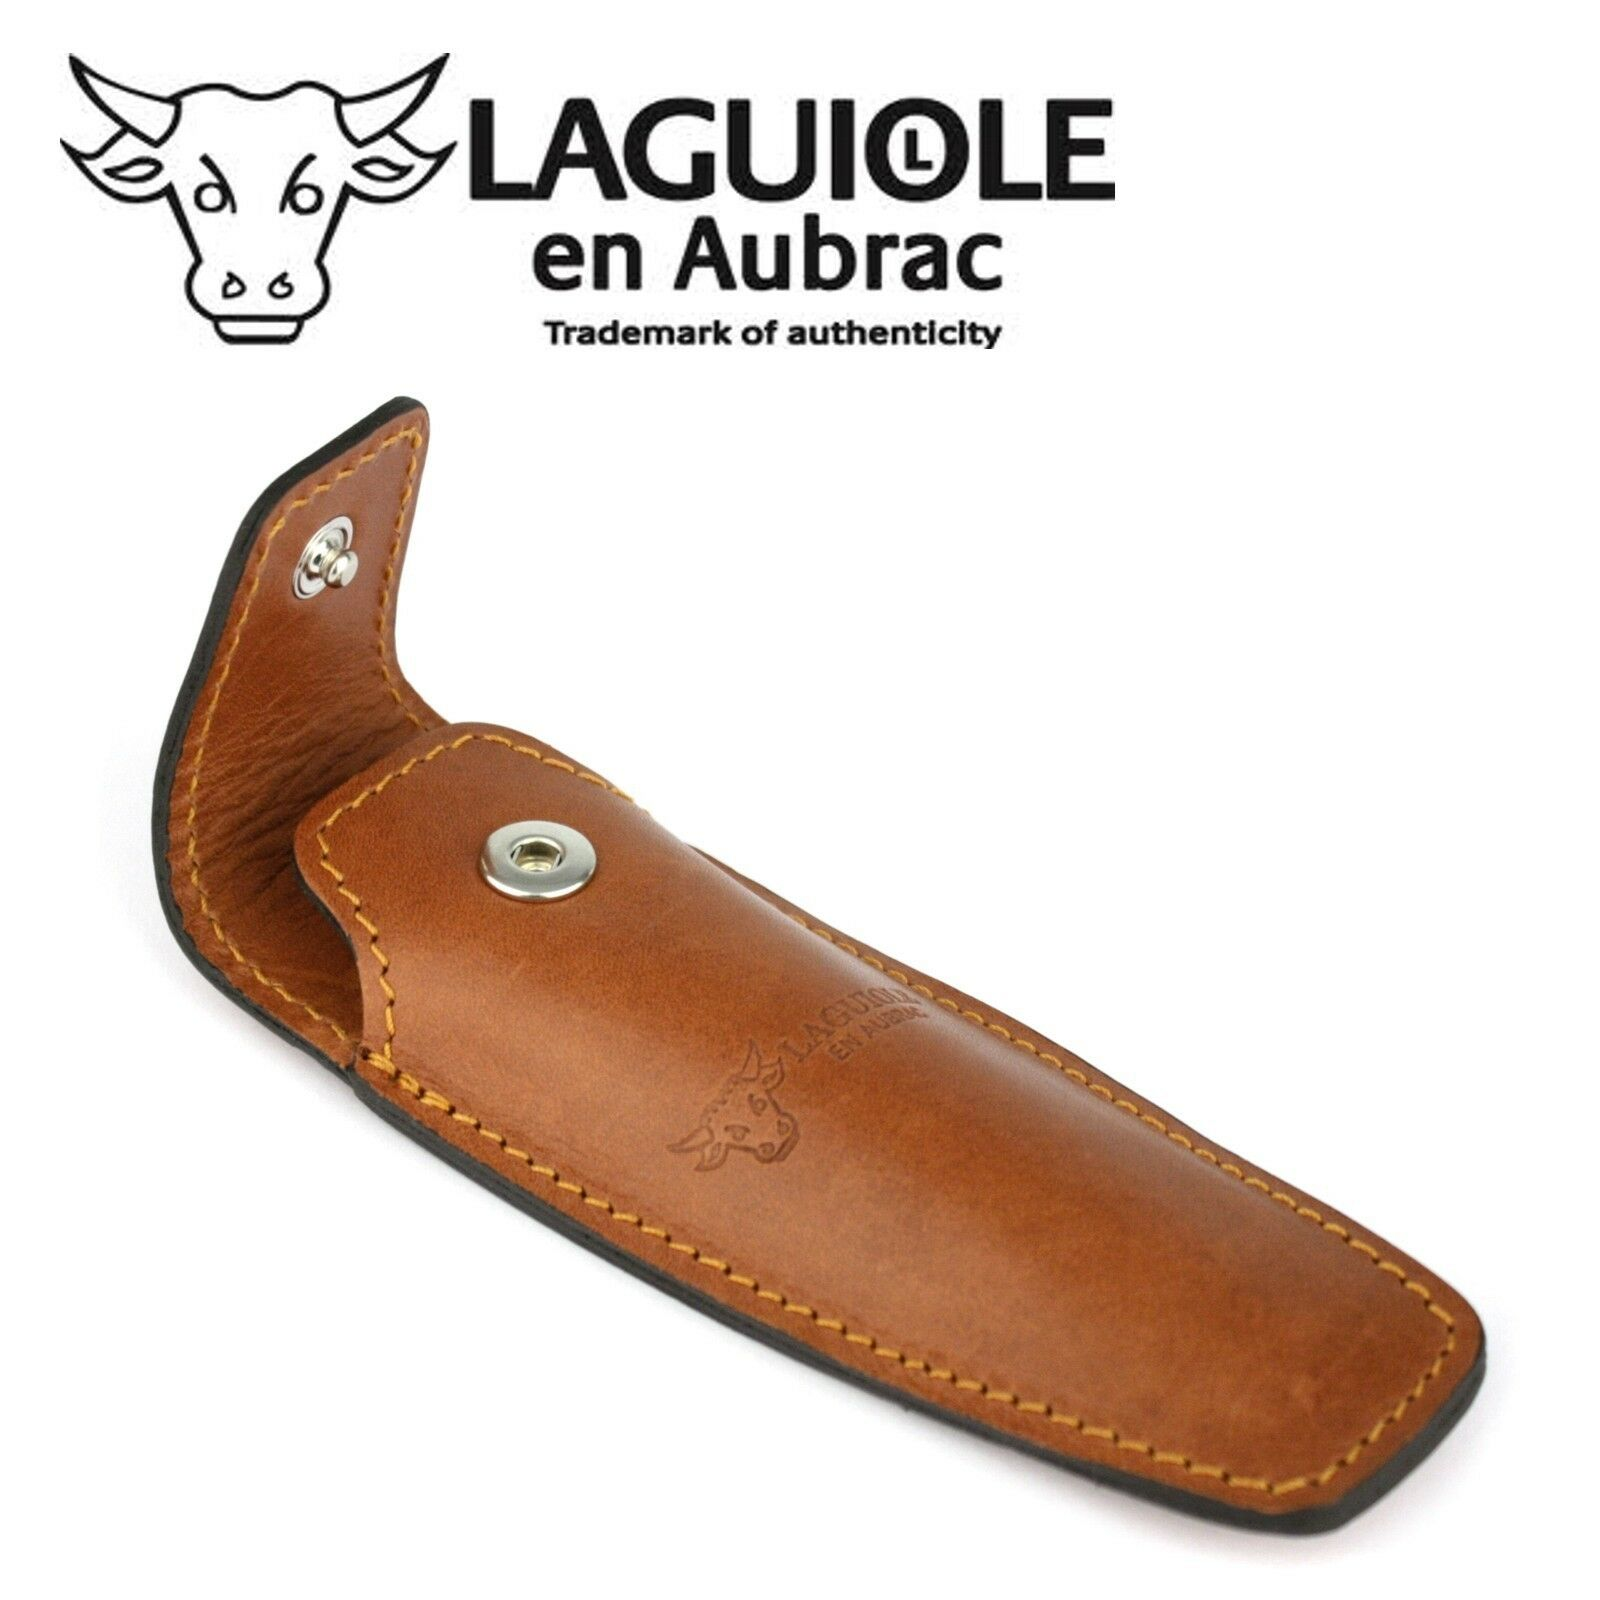 Laguiole en Aubrac ECA Gürteletui braun Leder Taschenmesser Messer Etui Tasche